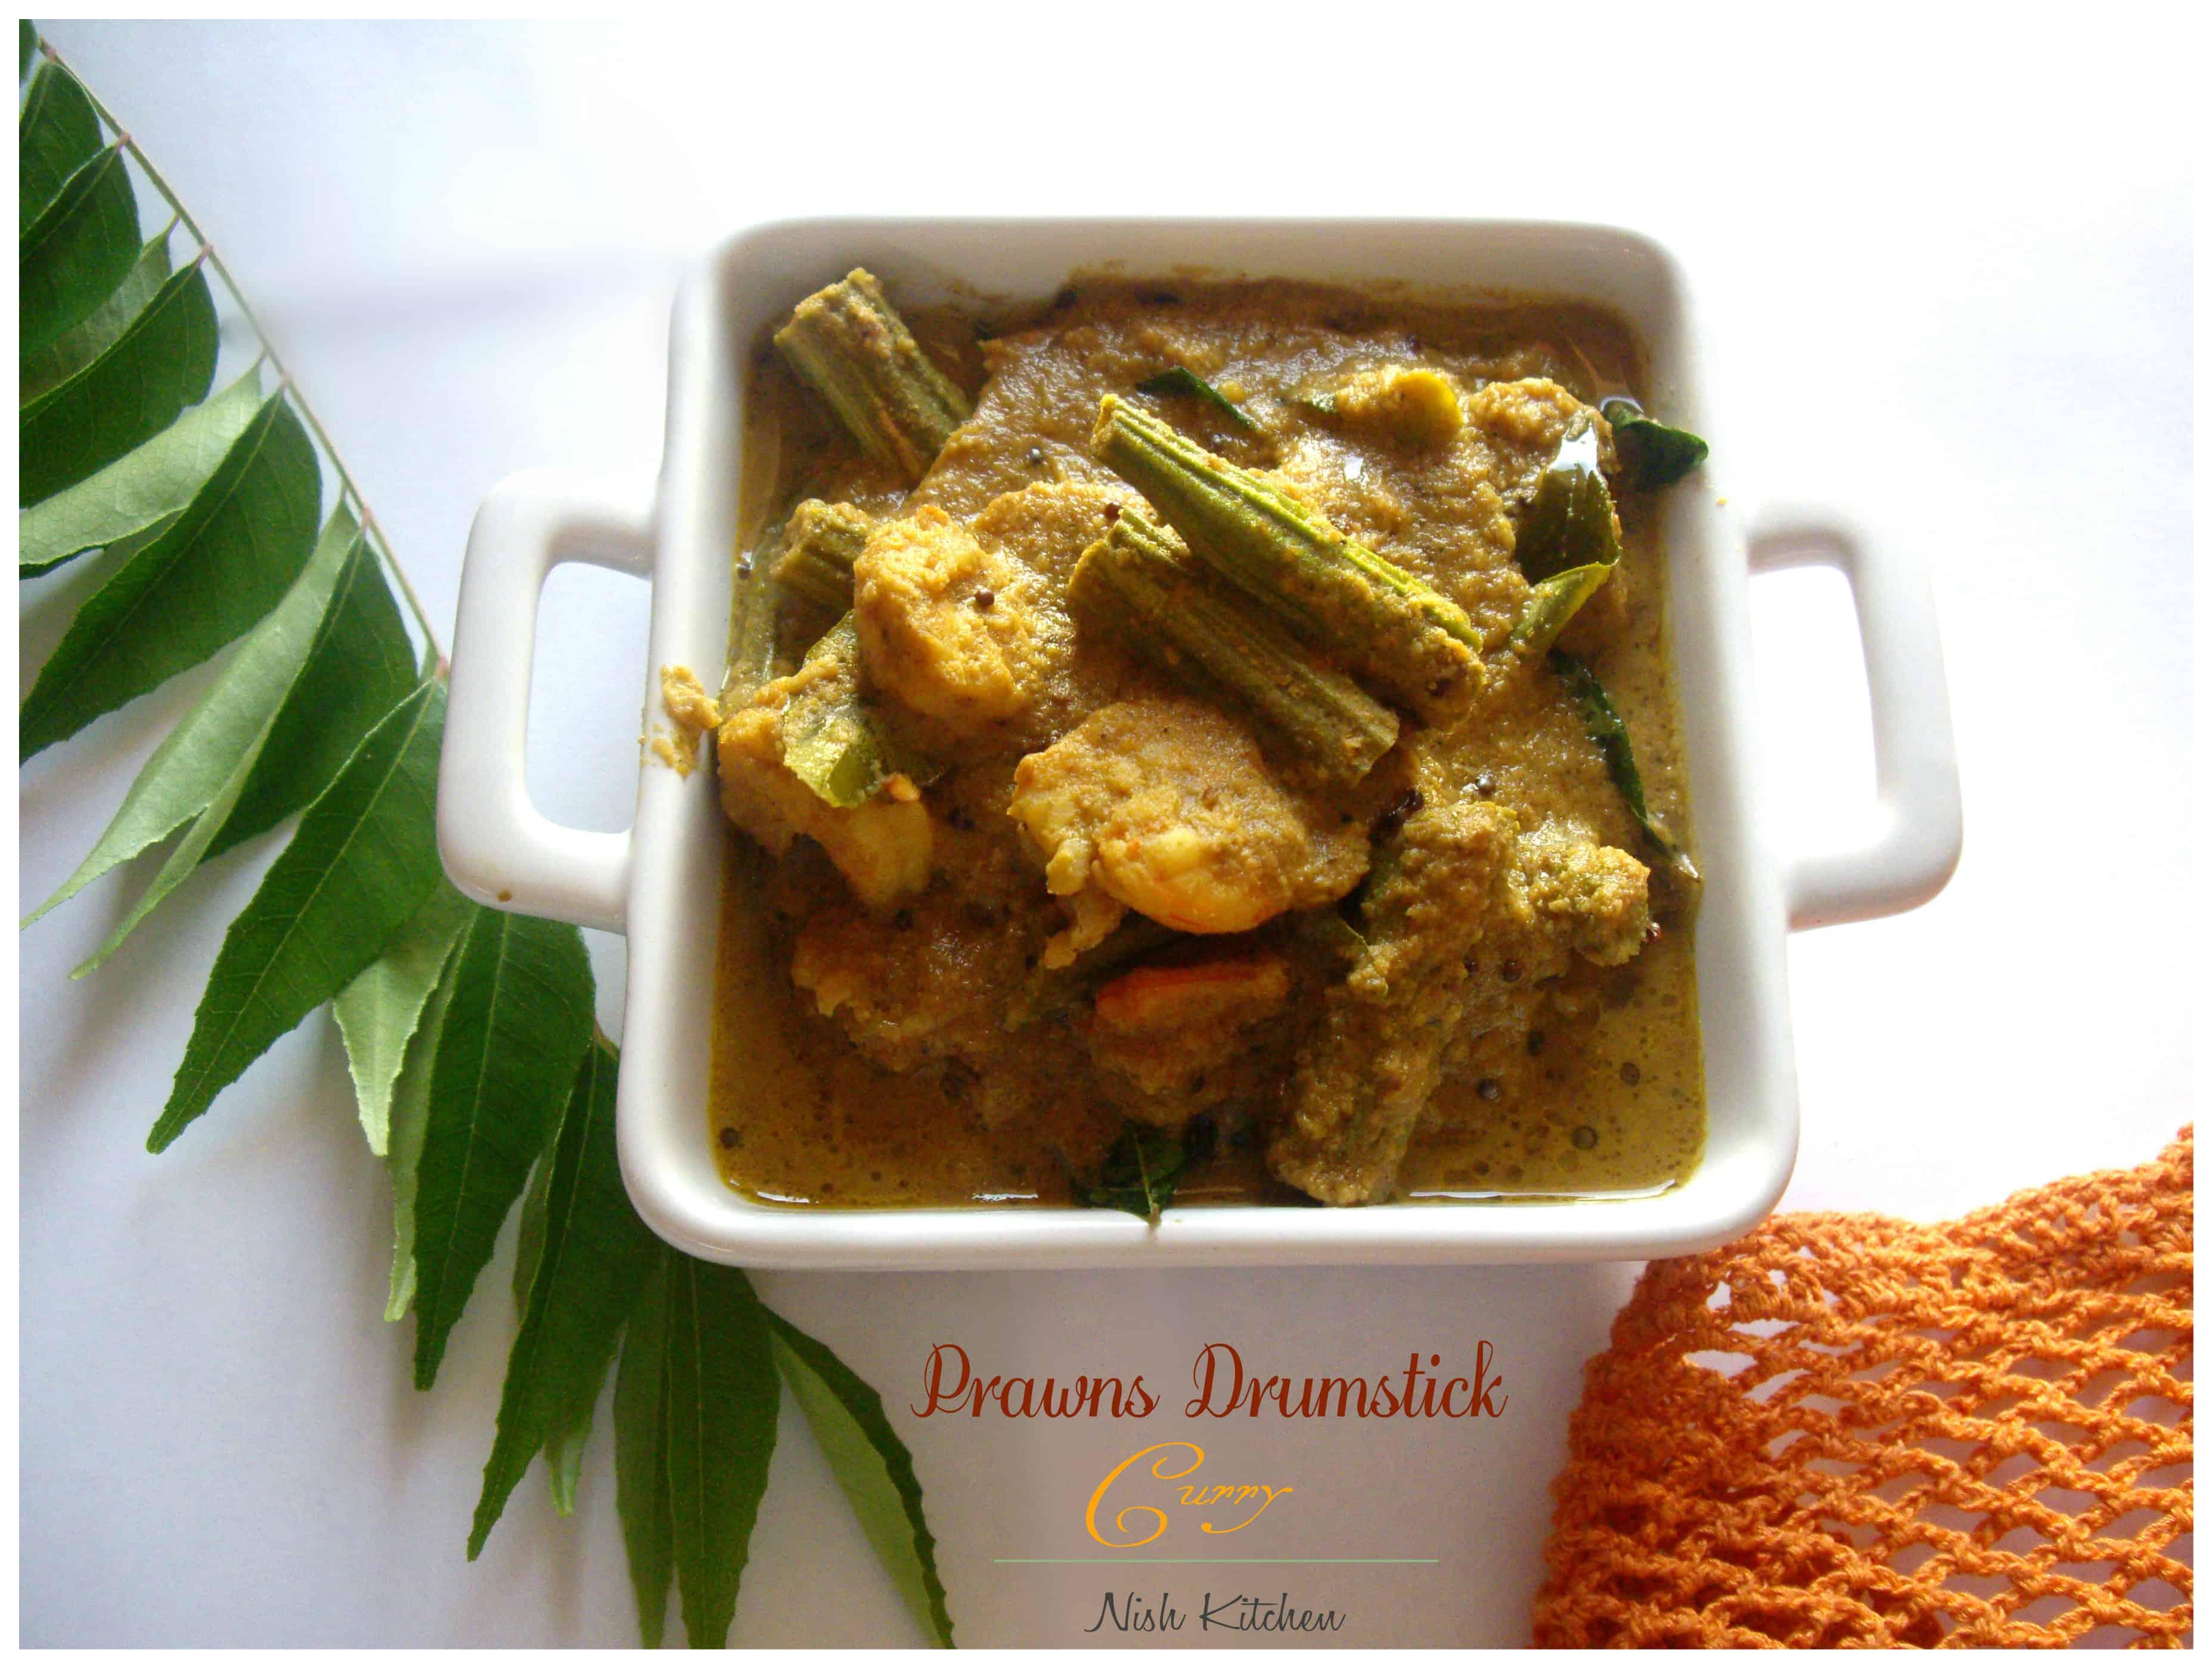 Prawns Drumstick Curry